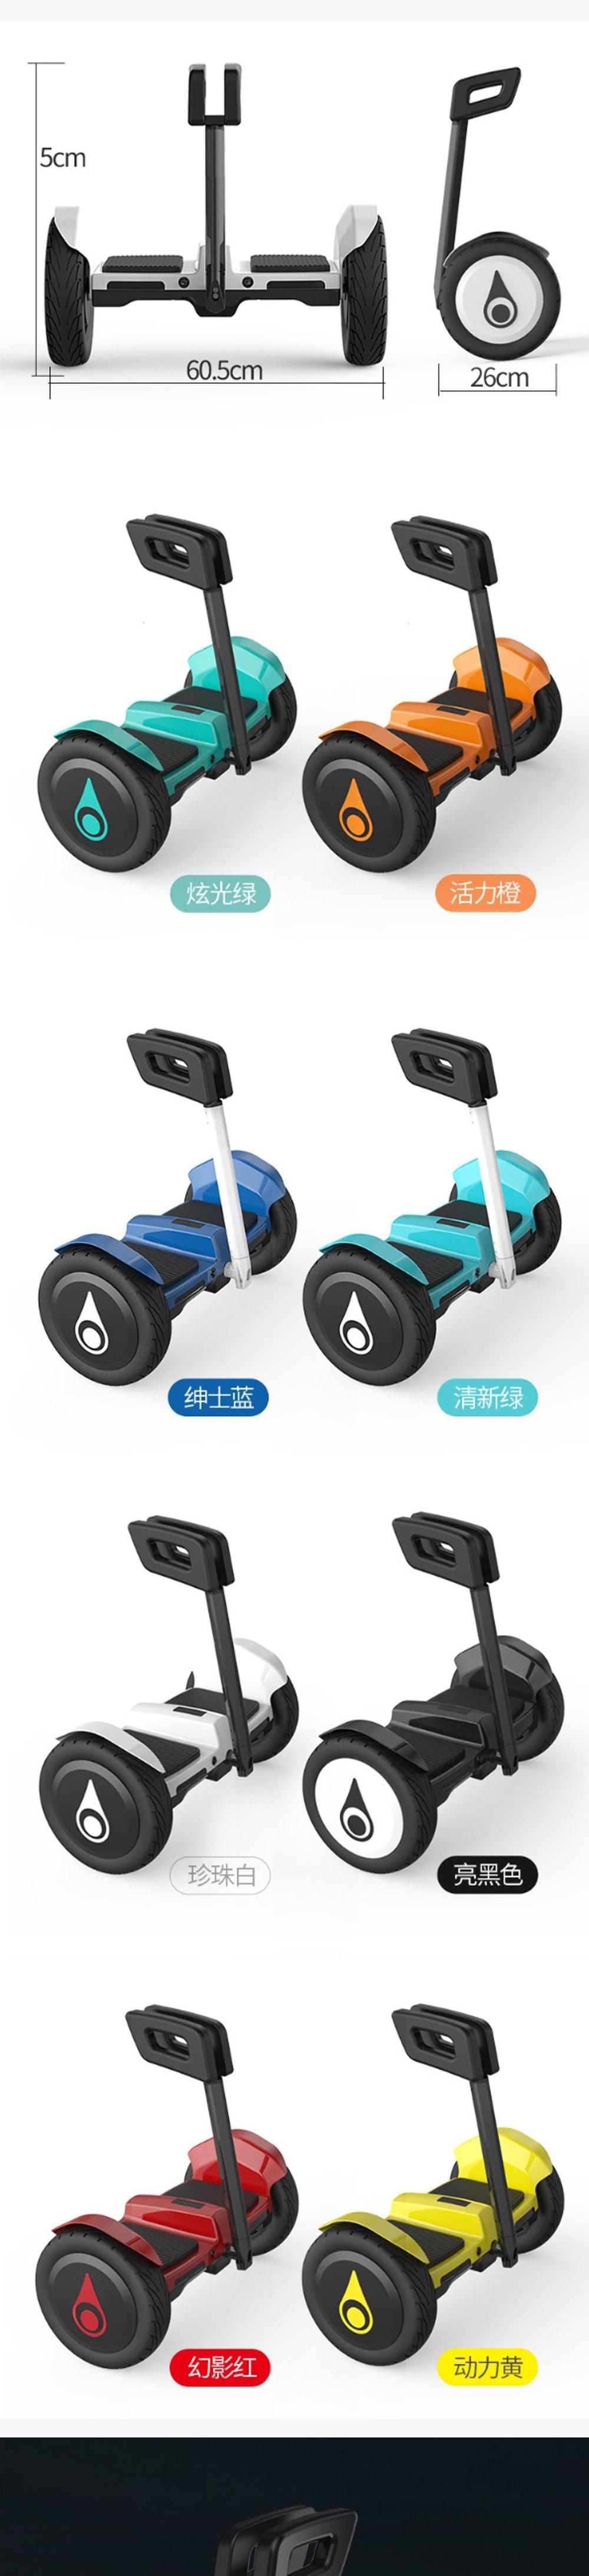 balance-scooter_01